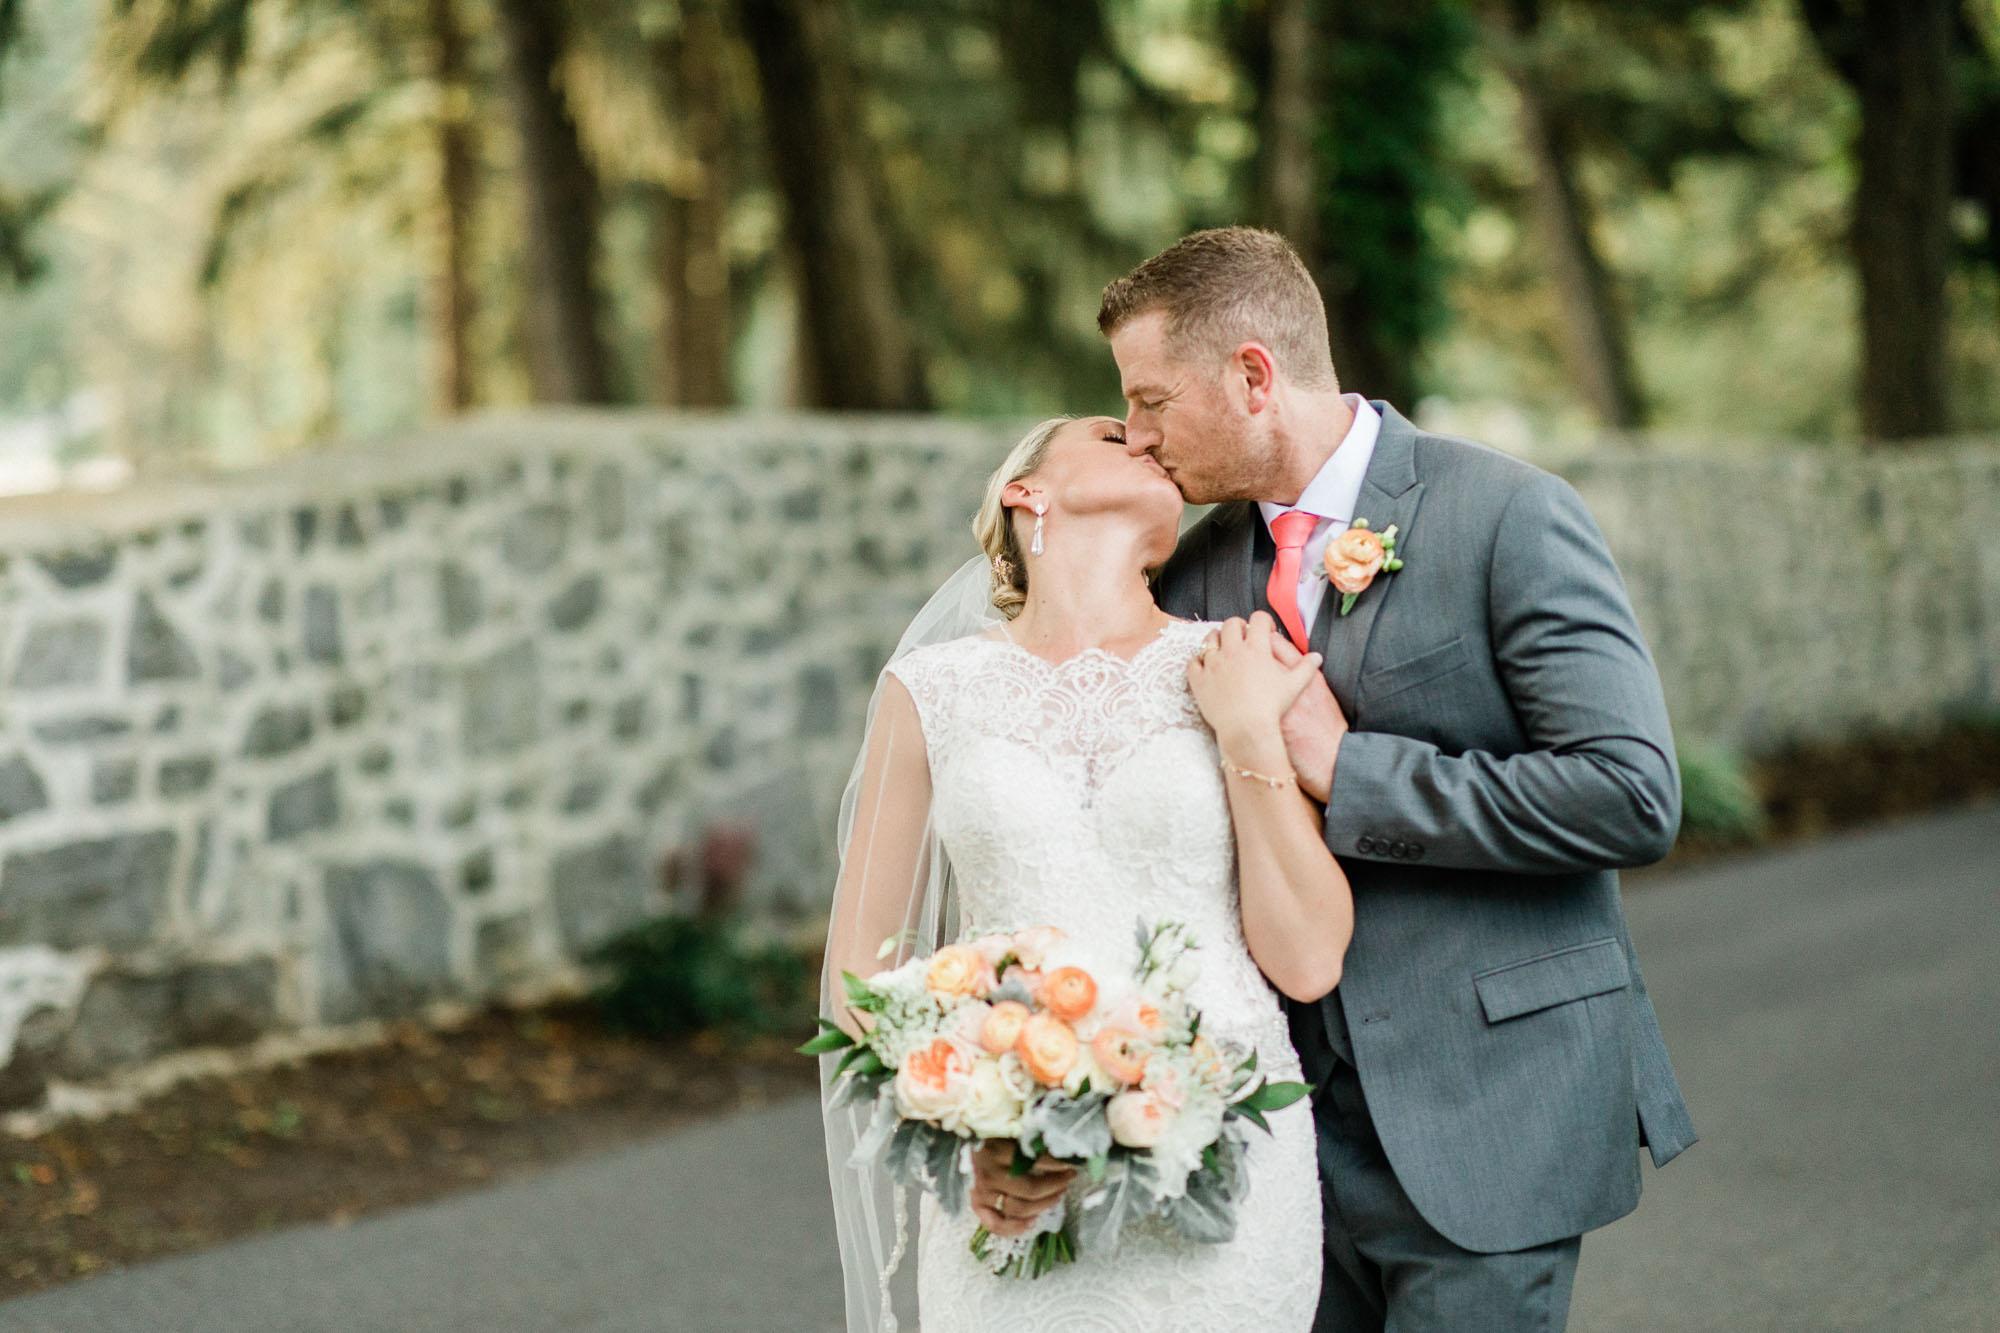 Allenberry-resort-historic-pennsylvania-wedding-22267.jpg